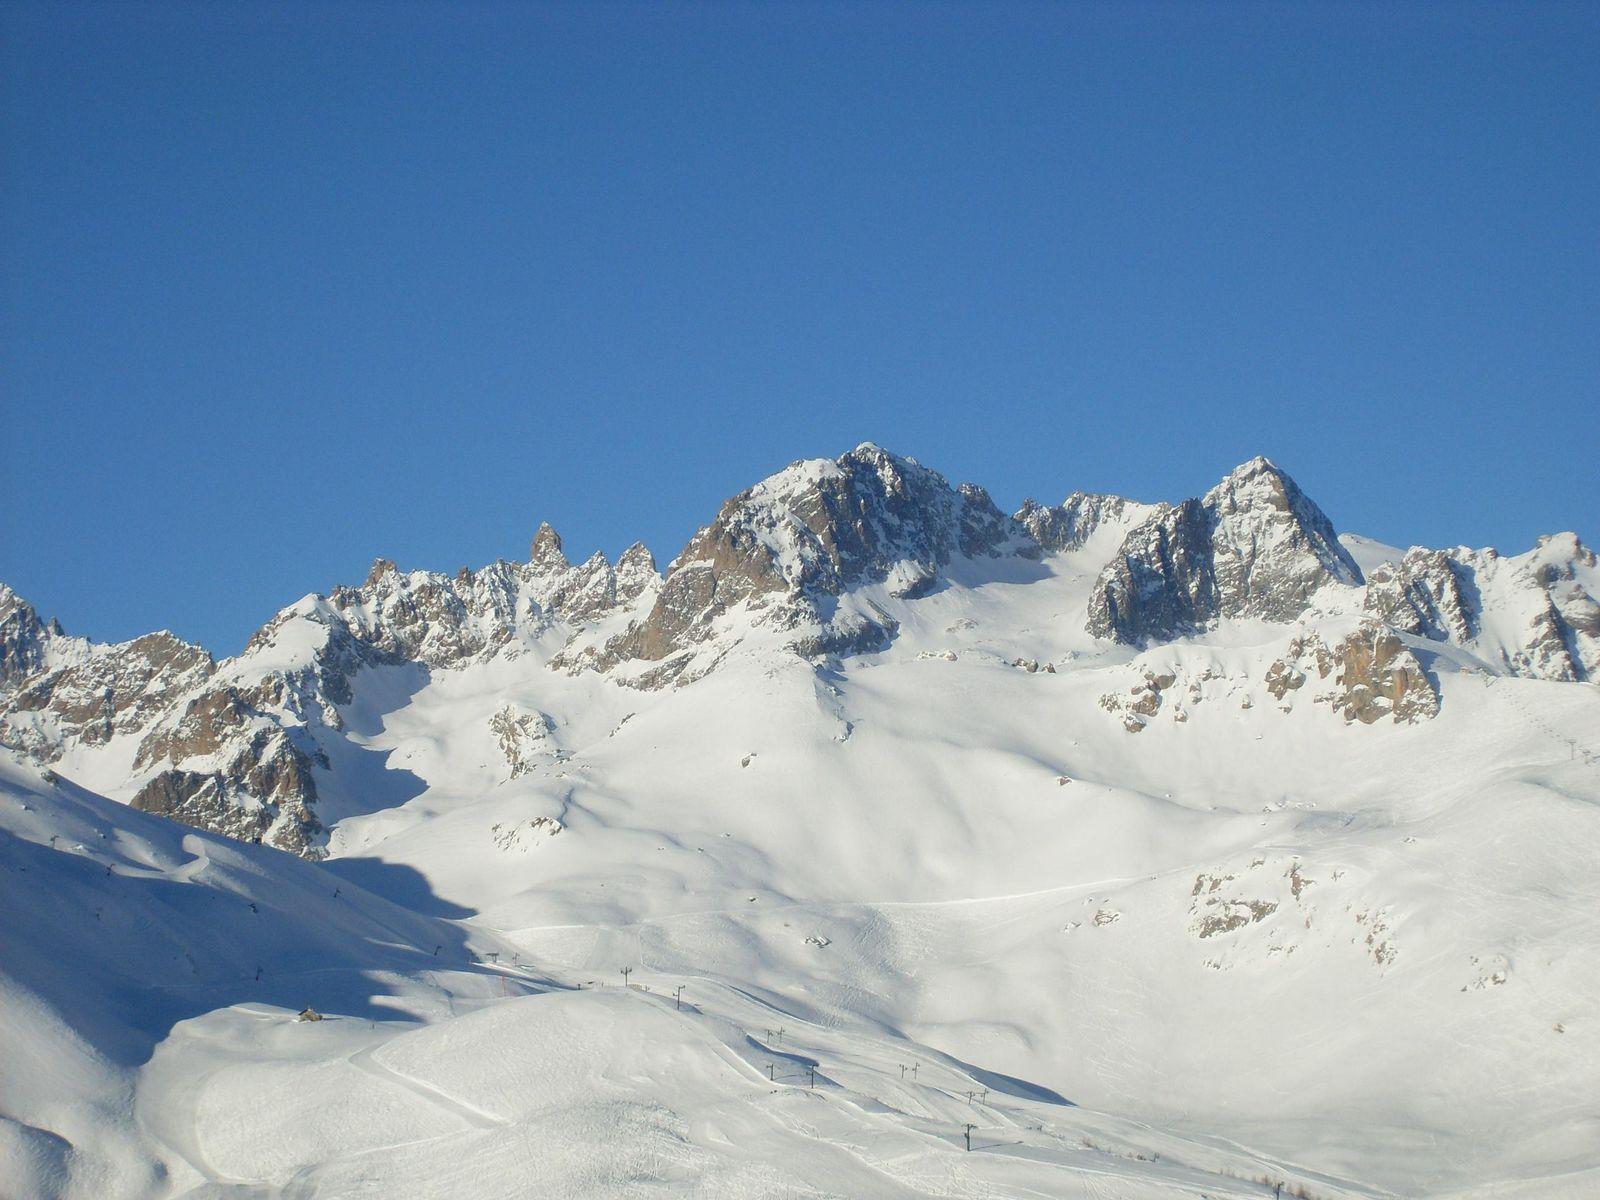 Domaine skiable SERRE CHEVALIER_Saint-Chaffrey (1)